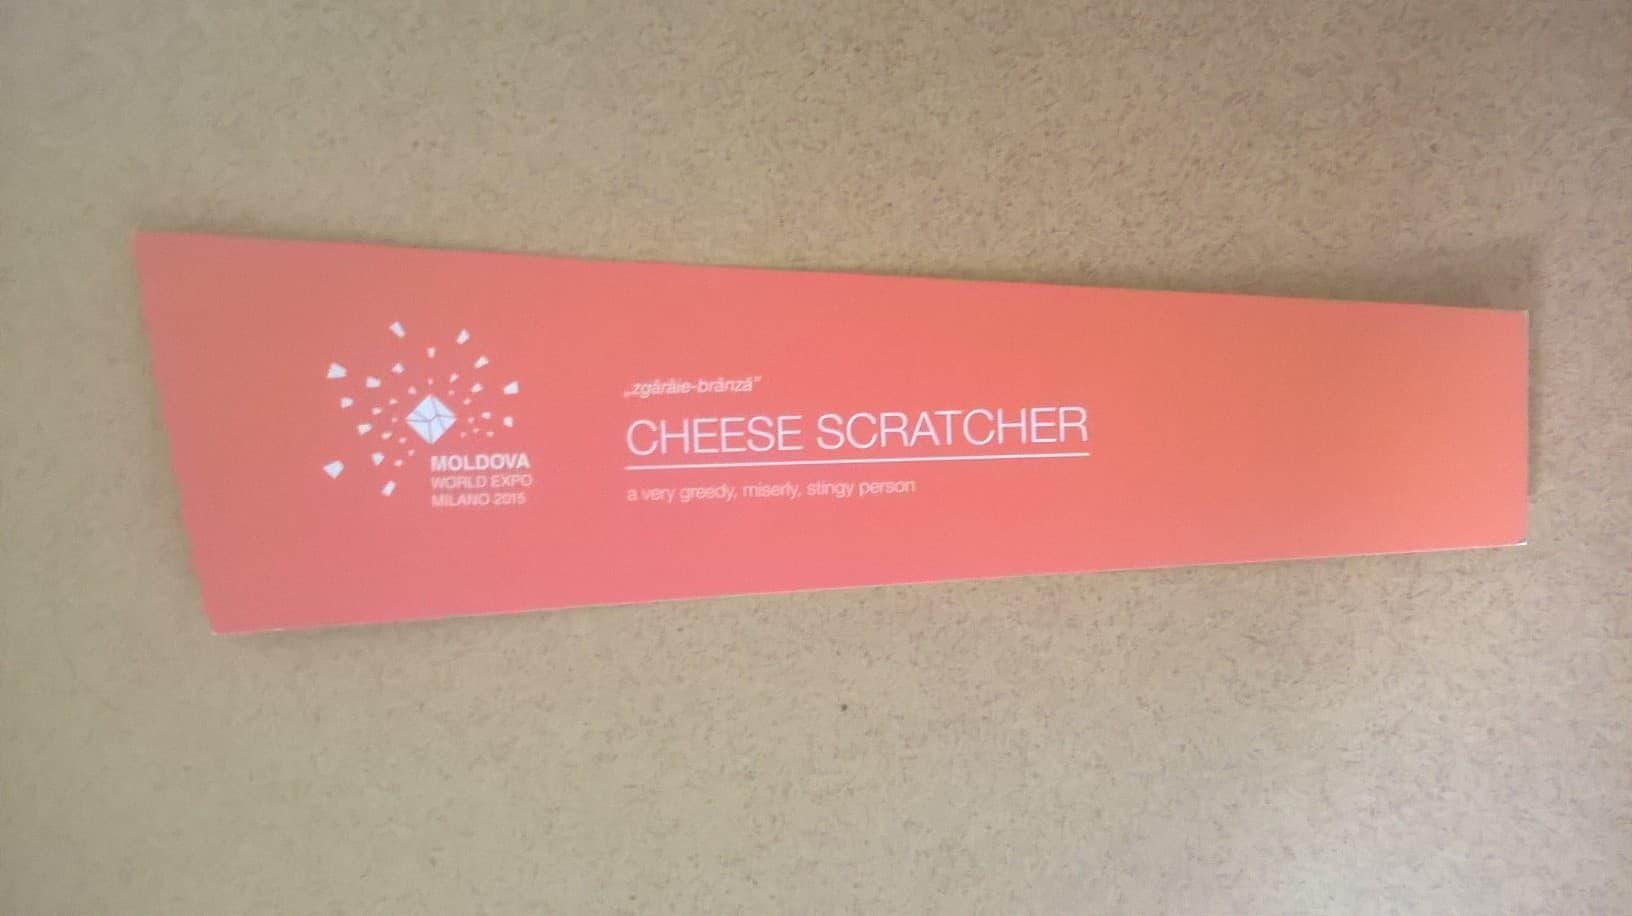 Cardboard cheese scratcher